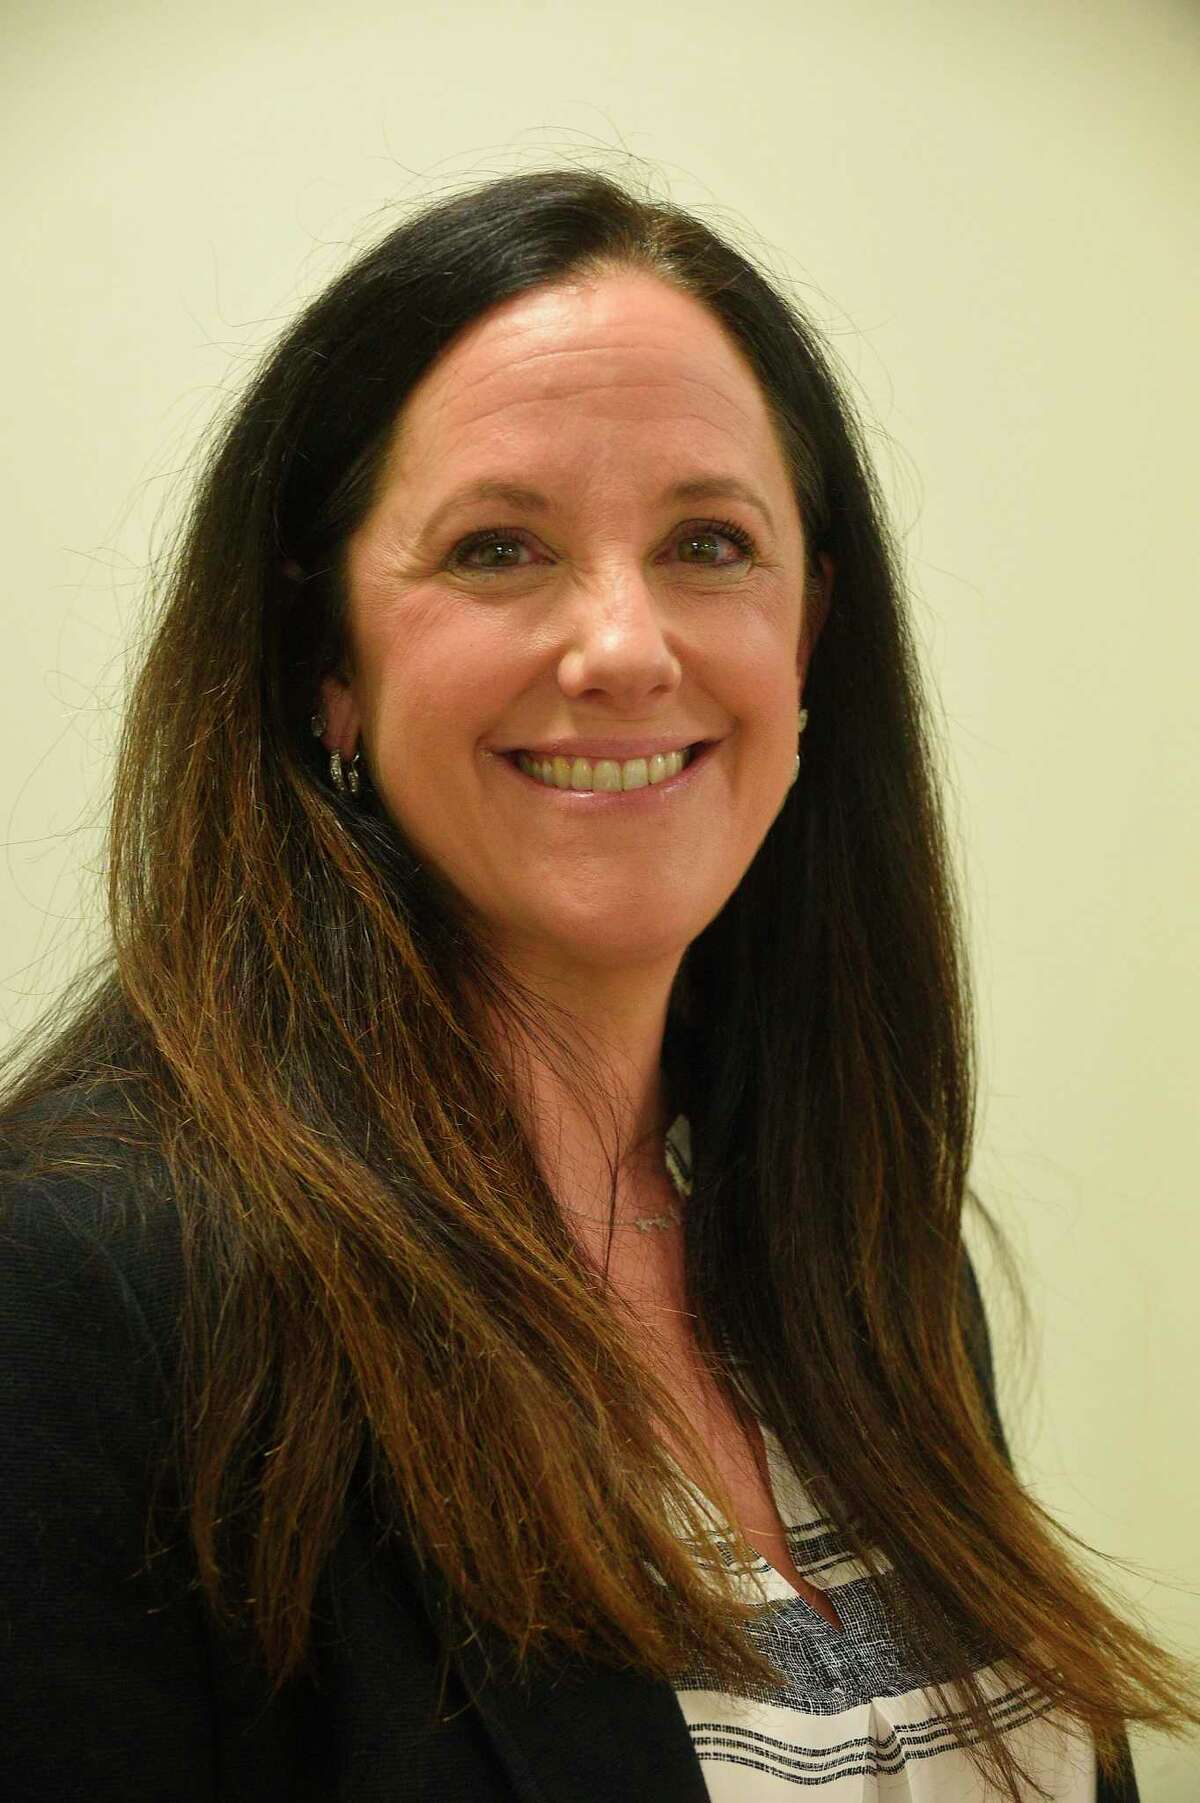 Karen Hirsh, a member of the Greenwich Board of Education Nov. 21, 2019.